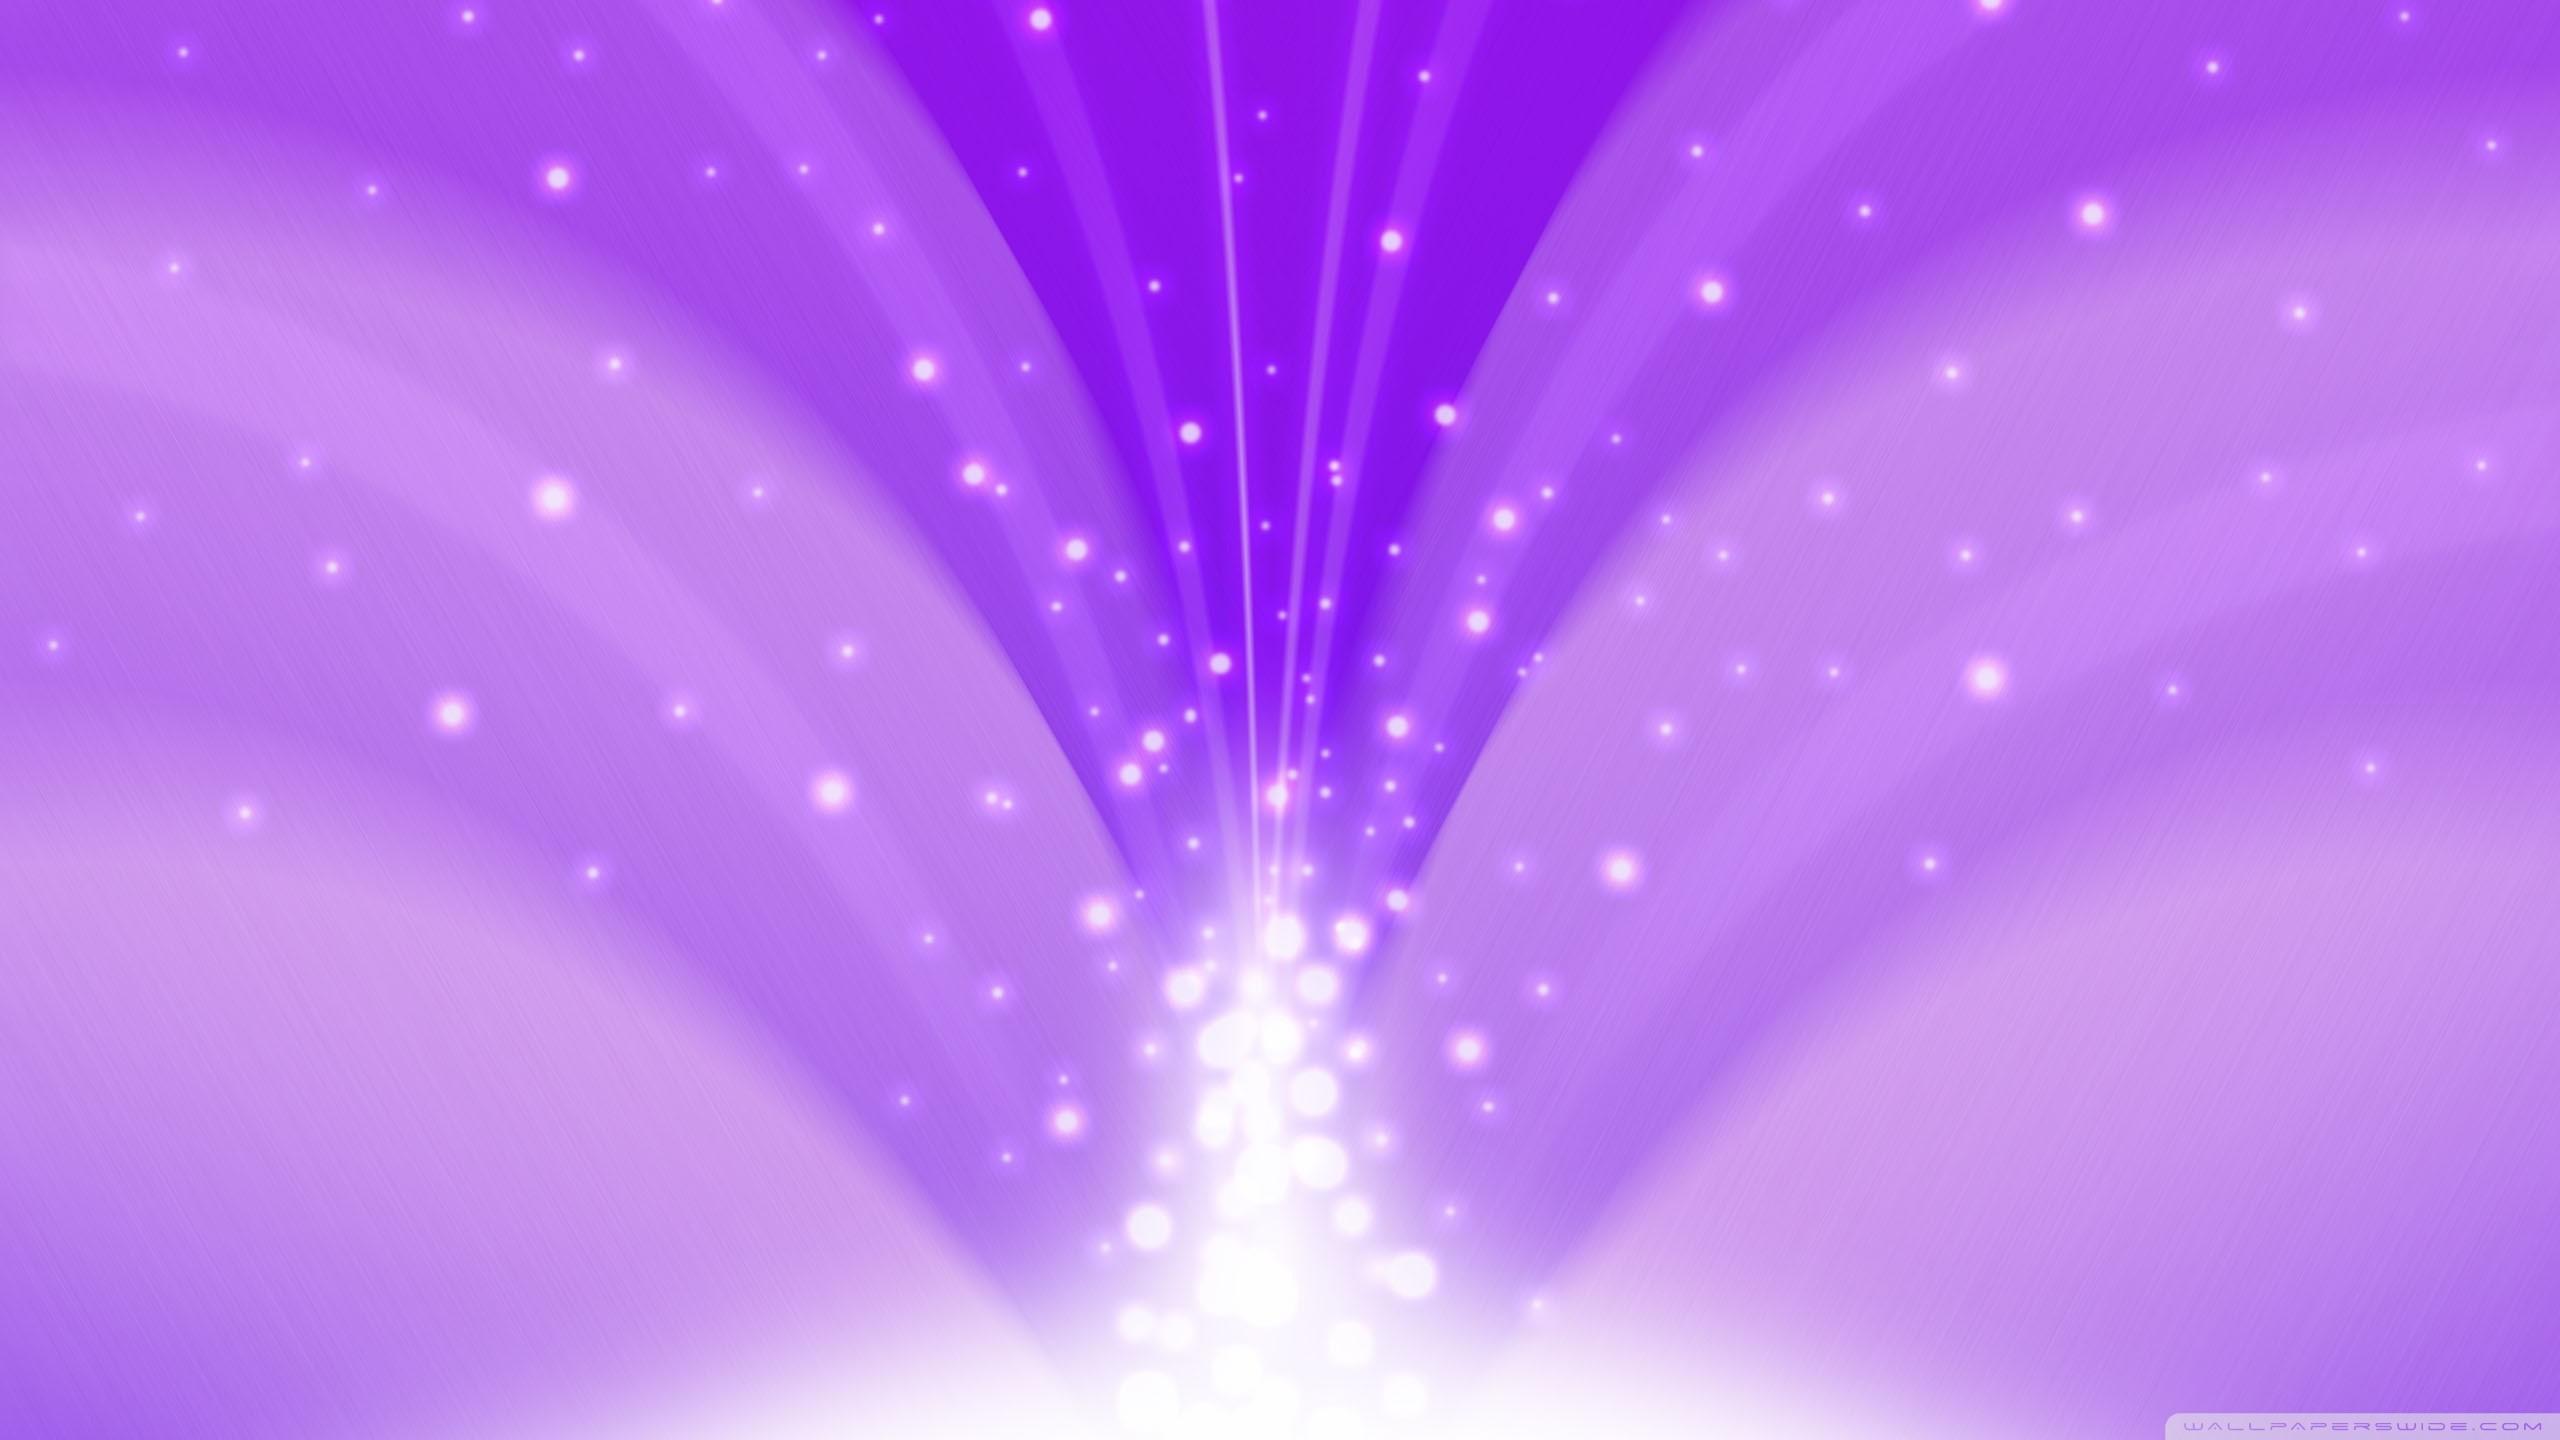 Cool Light Purple Wallpaper